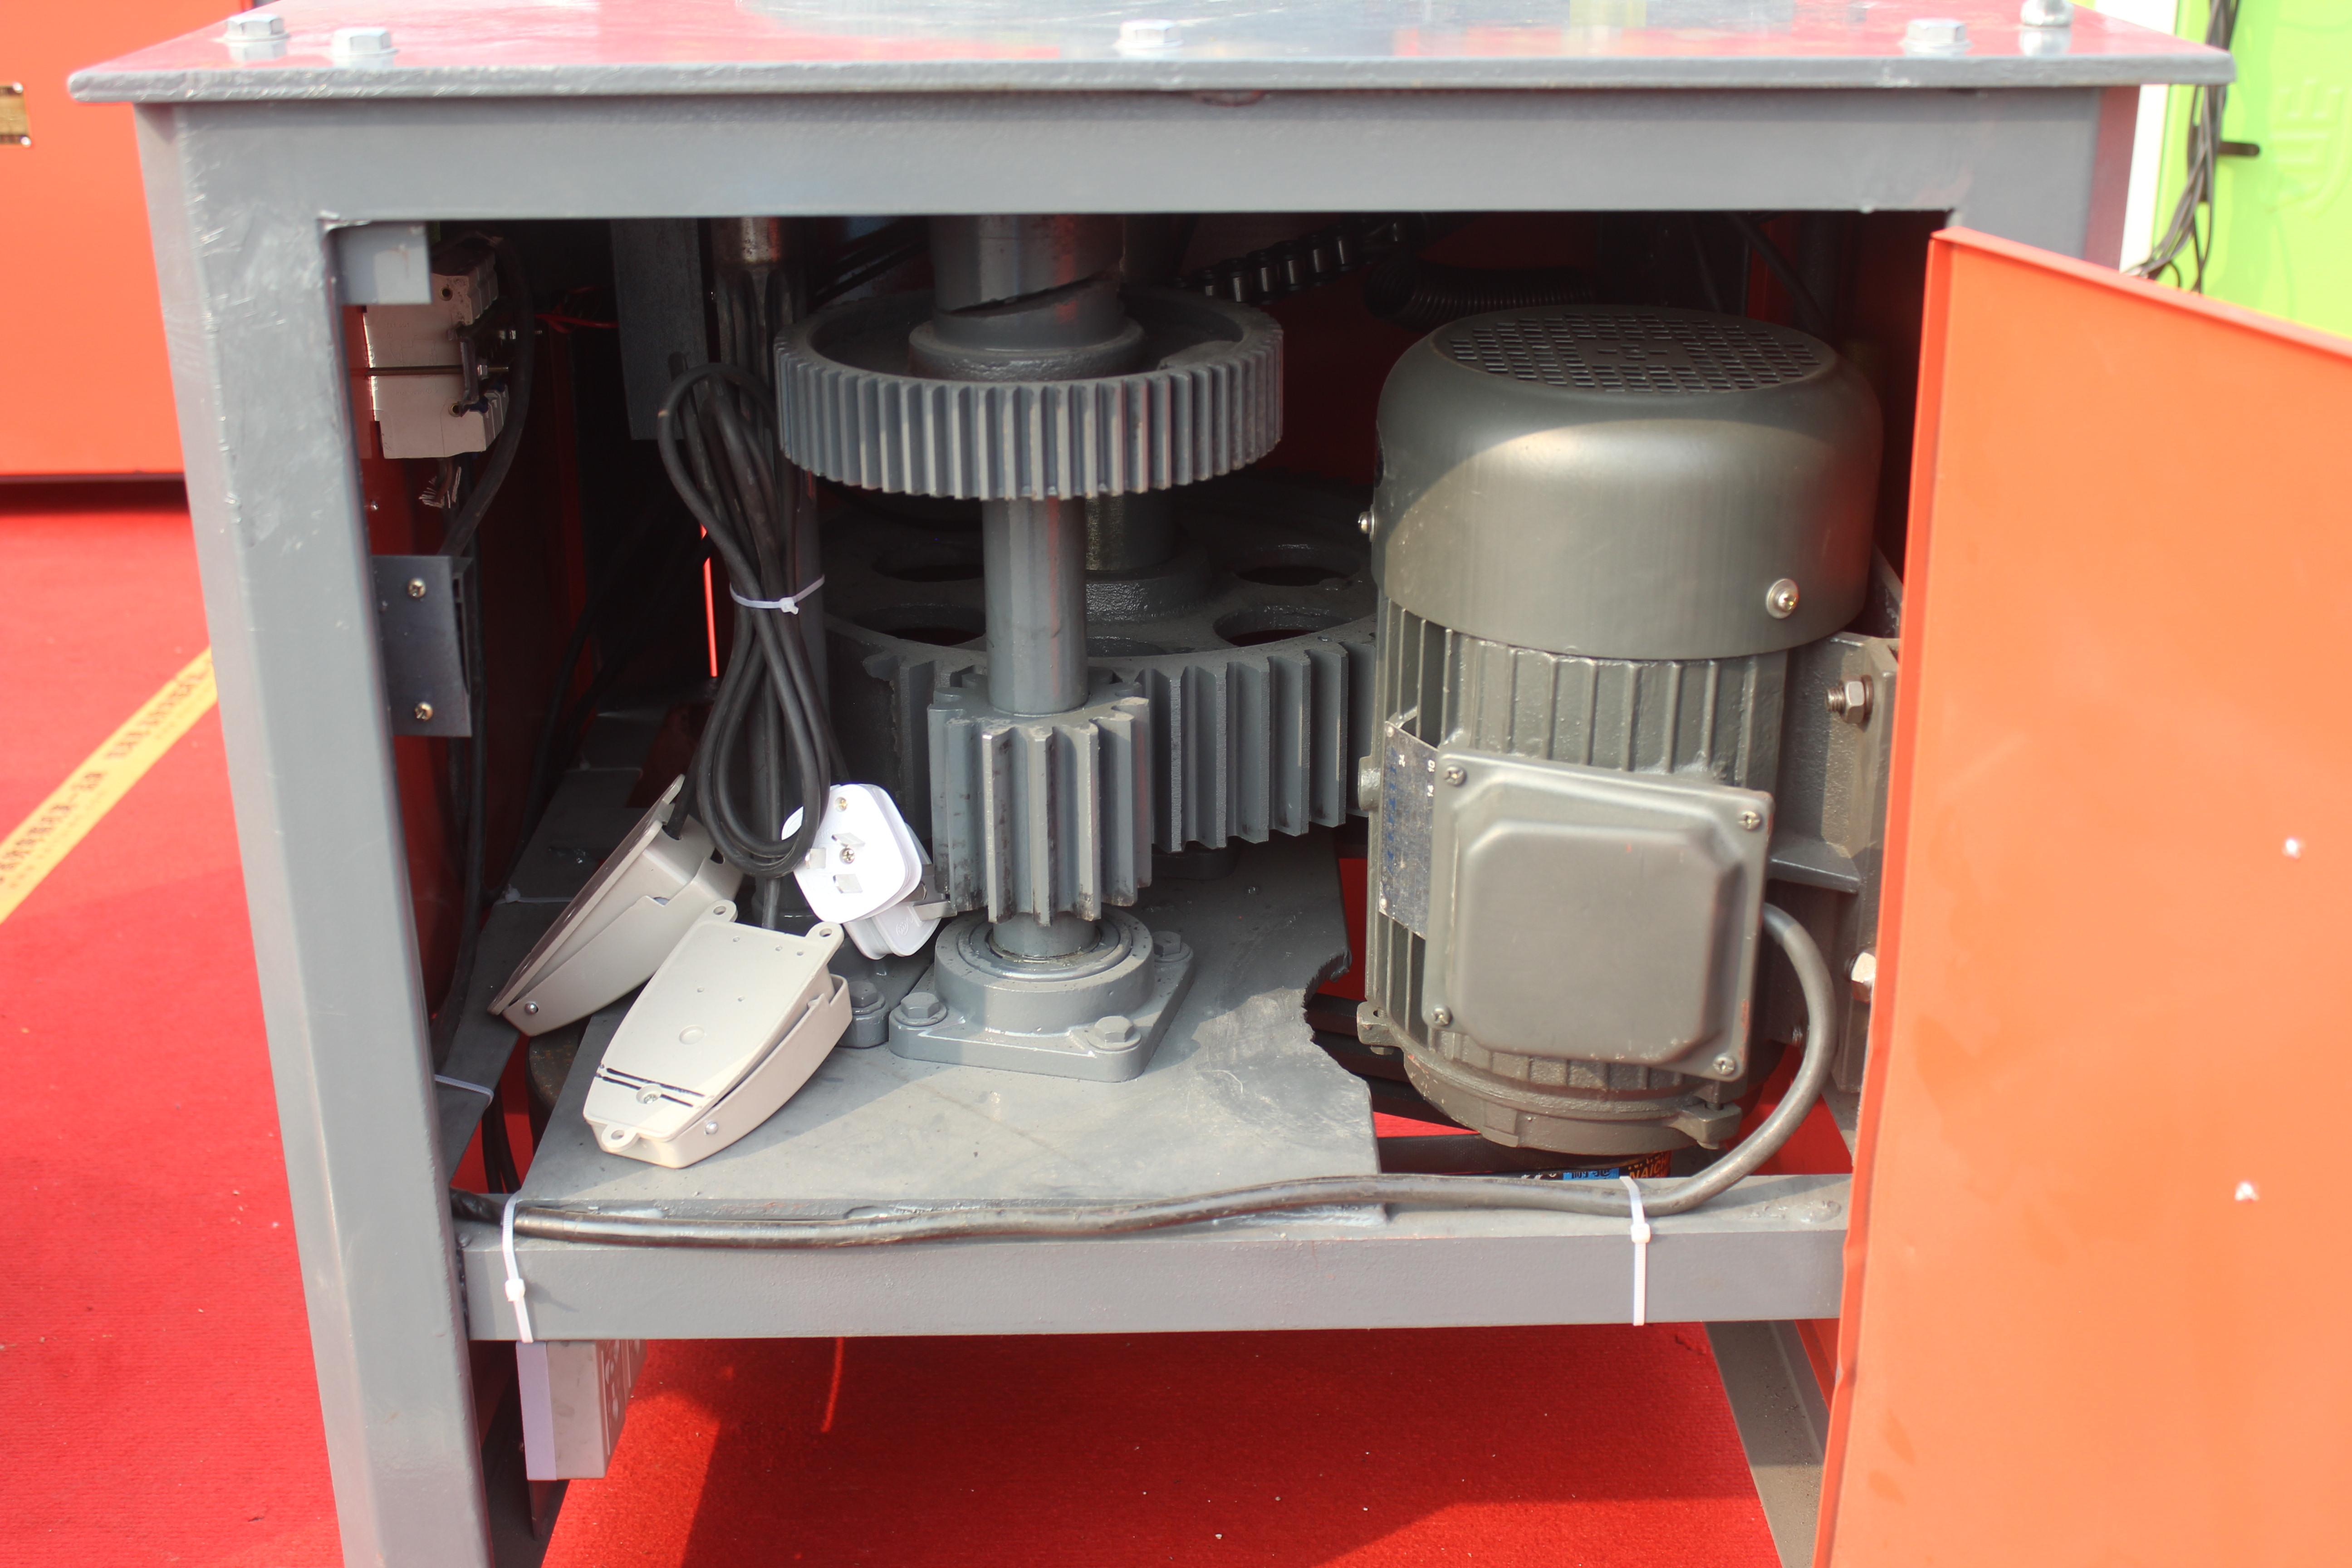 gw-32e多功能弯曲机|钢筋弯曲机系列|凯瑞恩服务热线